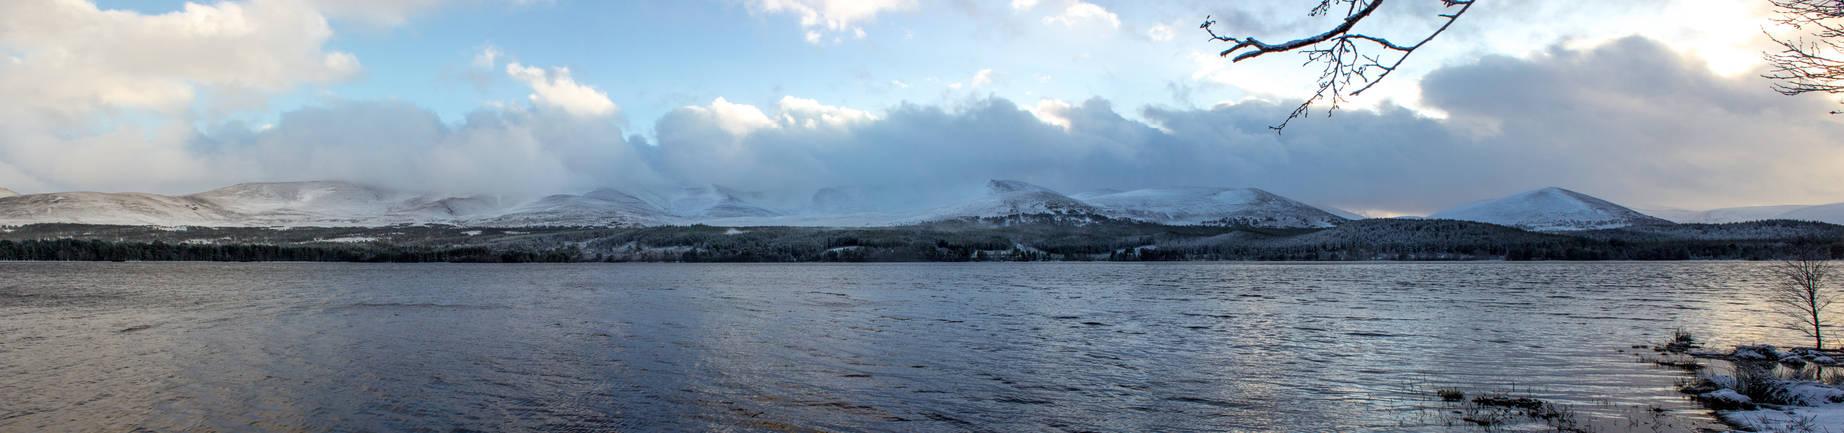 Loch Morlich Panorama